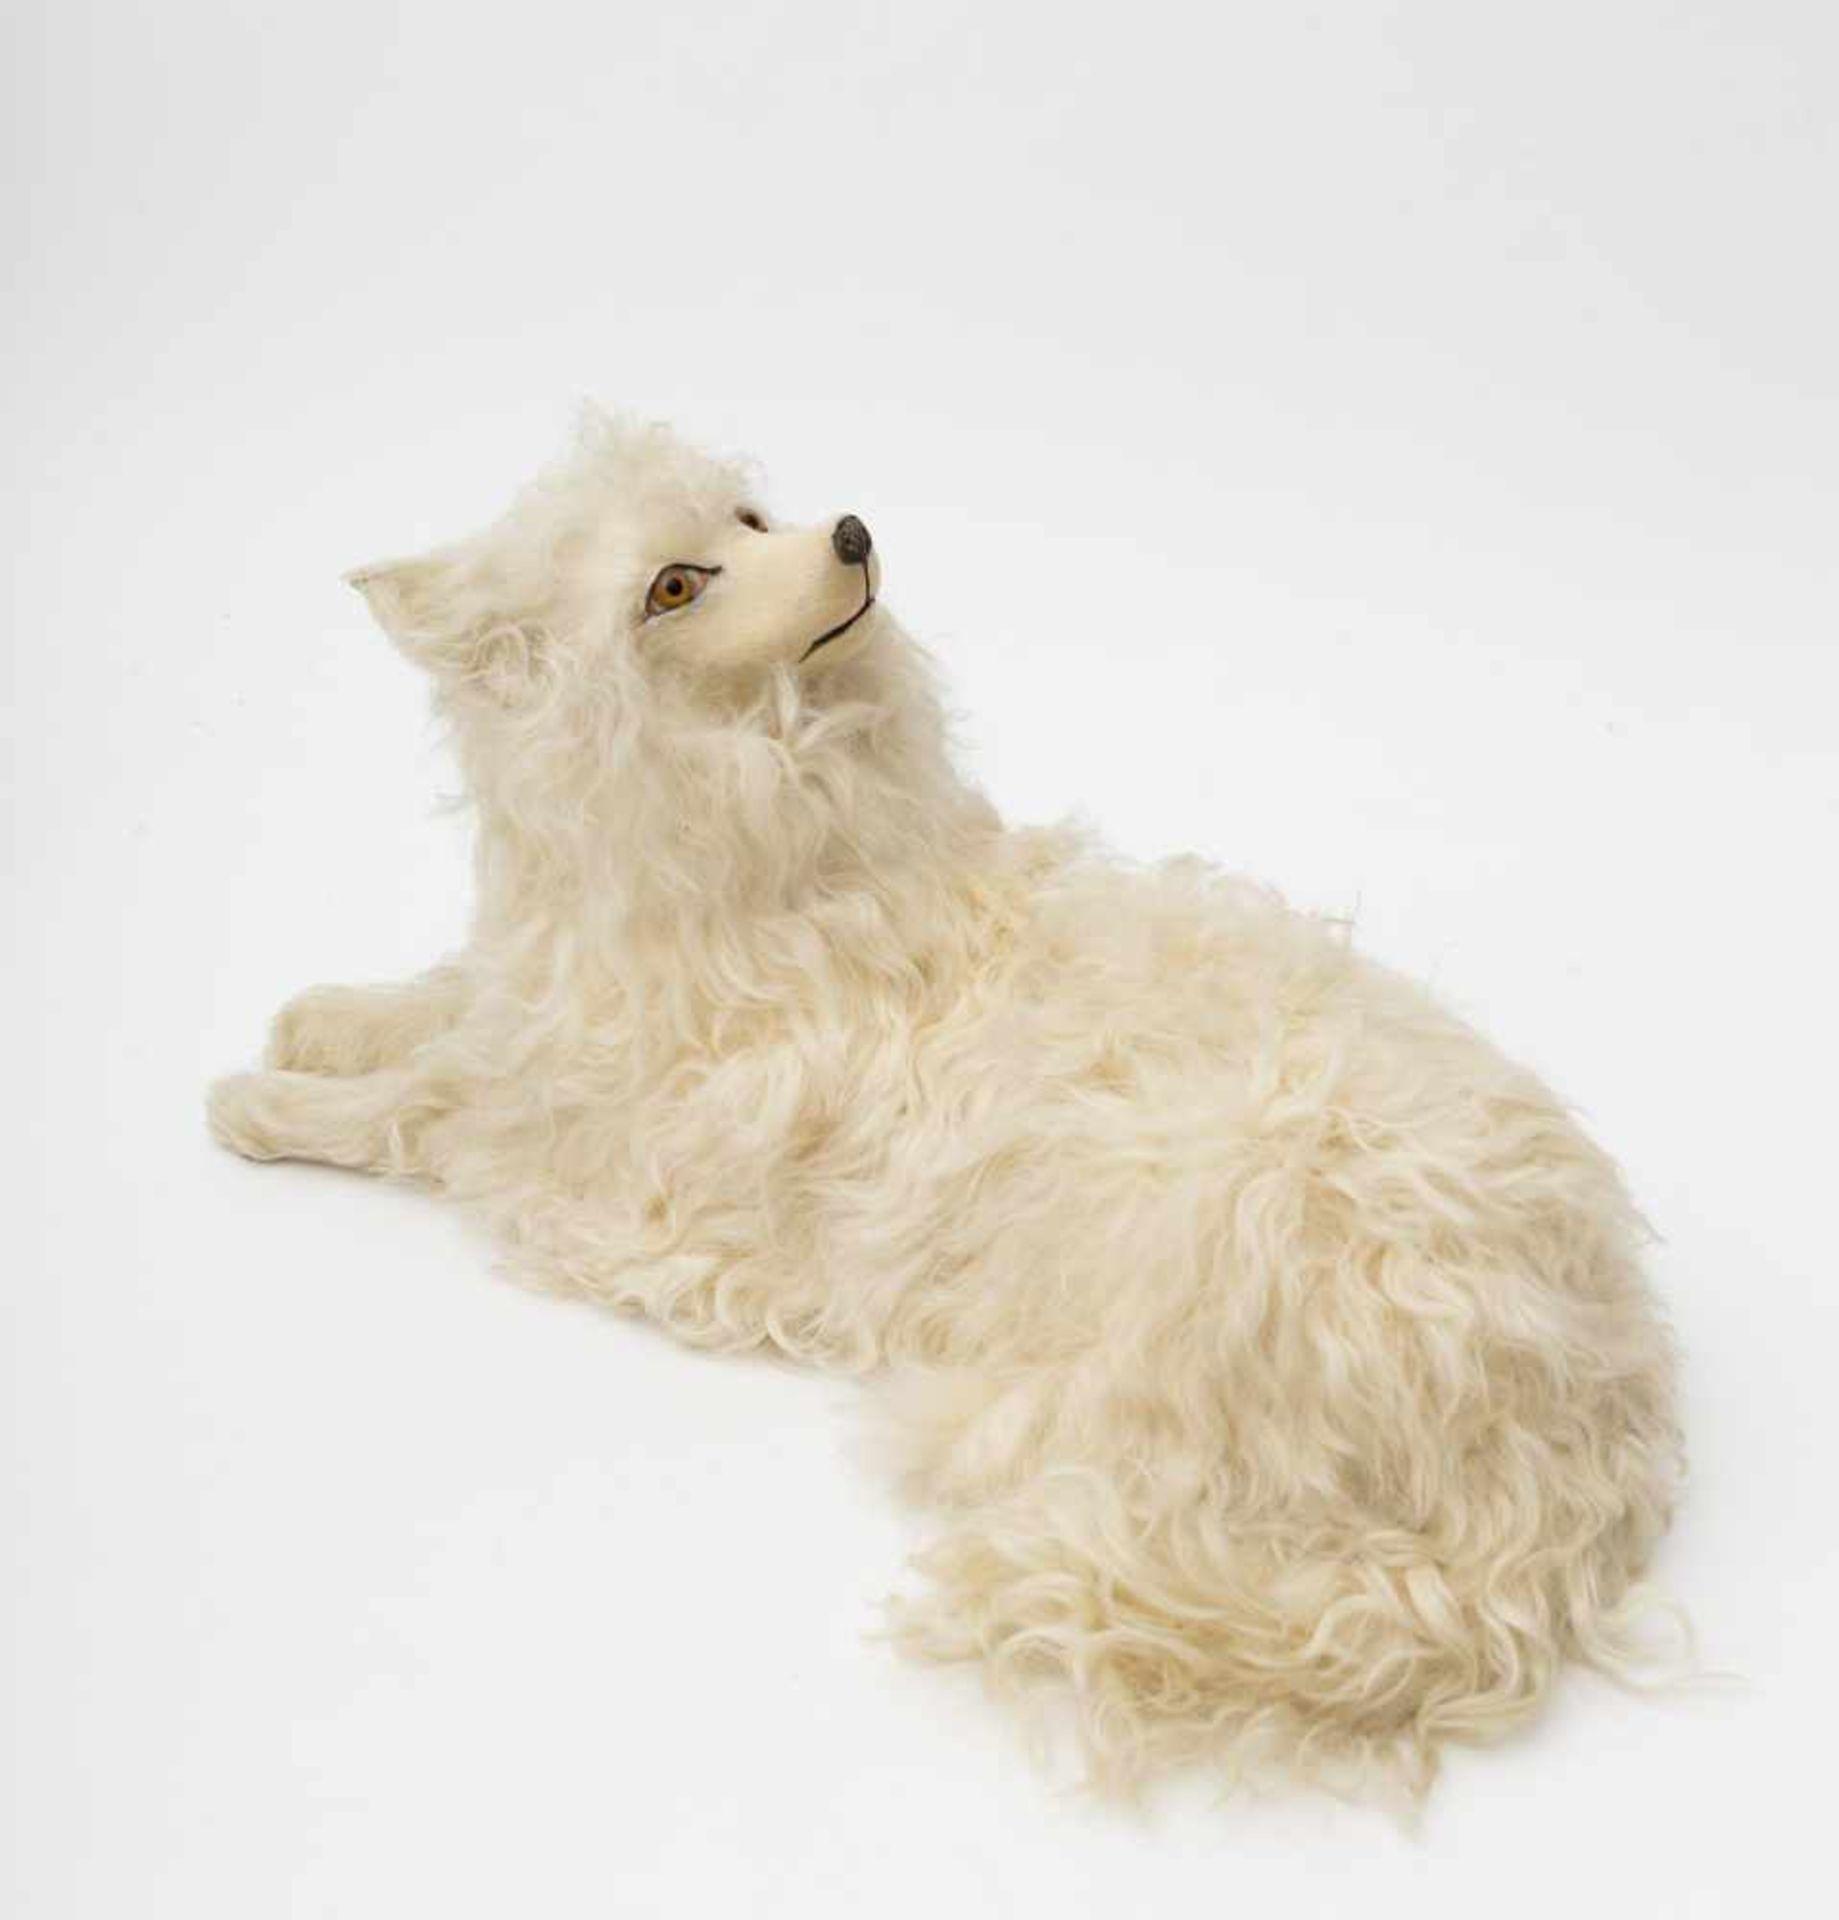 Pyjama carrier Depicting a Pomeranian dog.